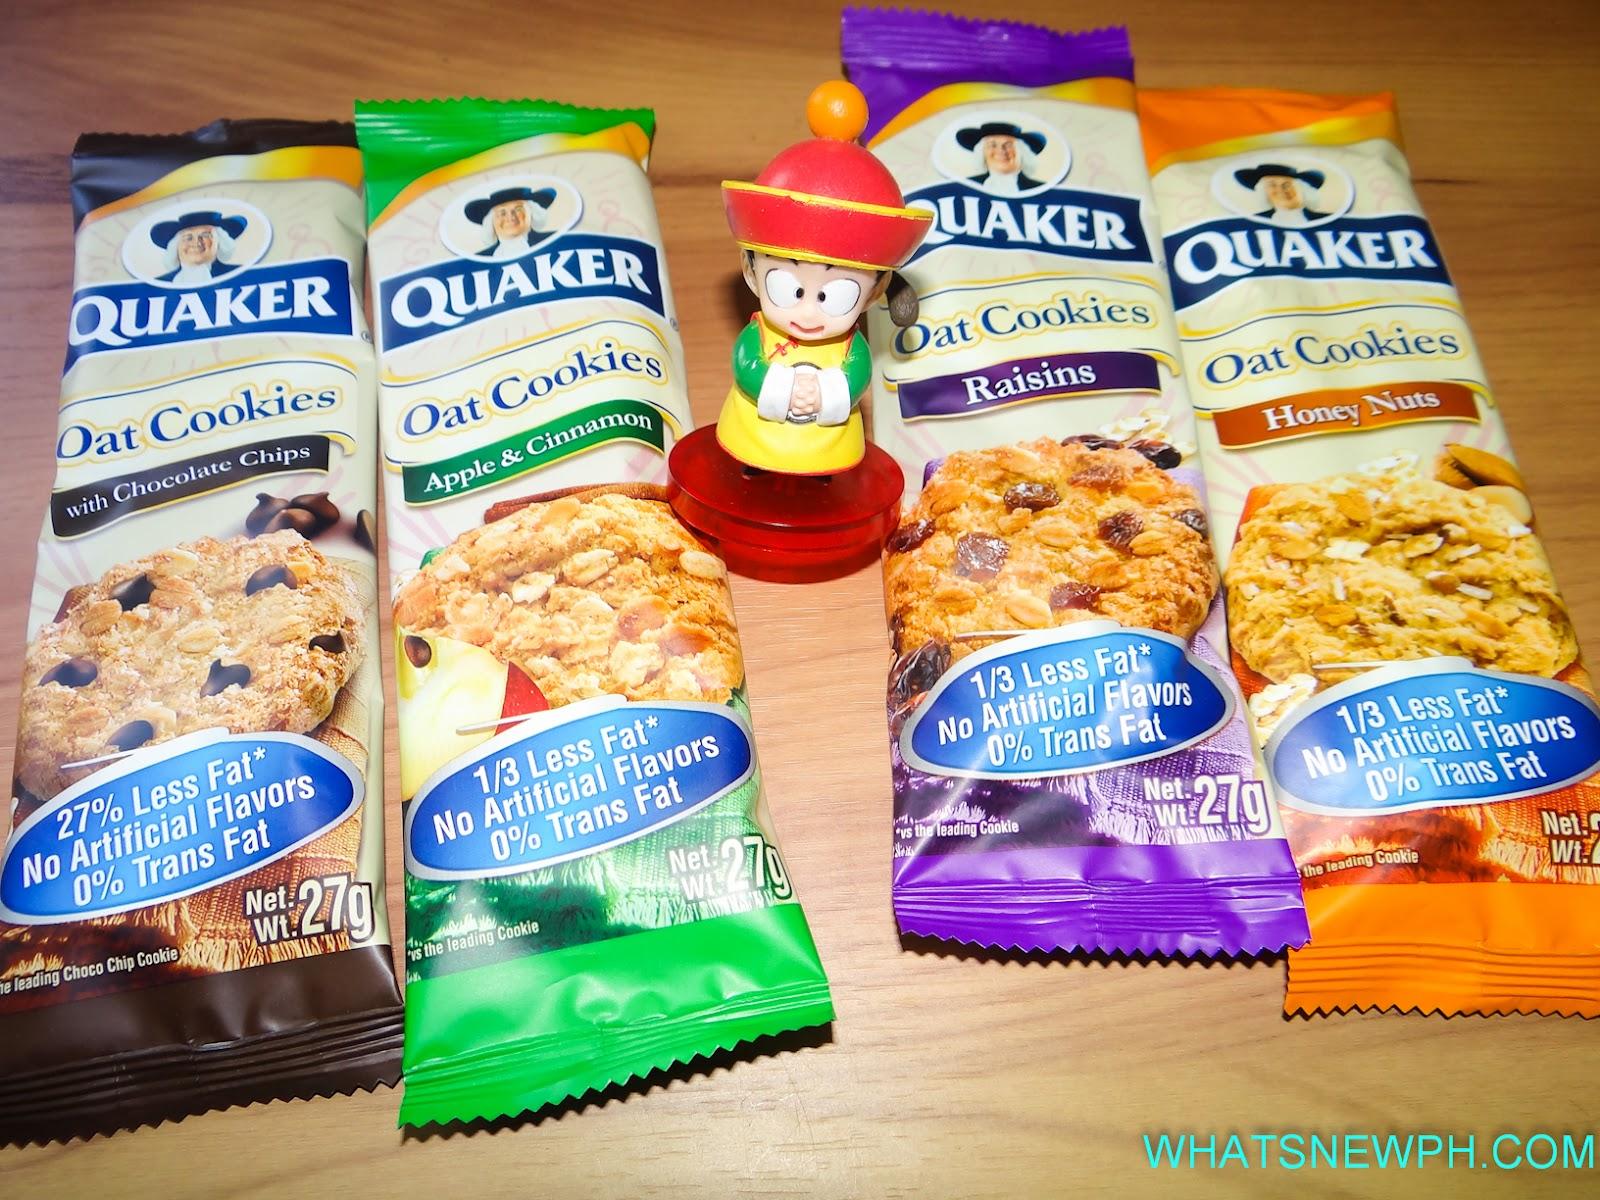 Quaker Oatmeal Cookies Quaker Oats Coo...